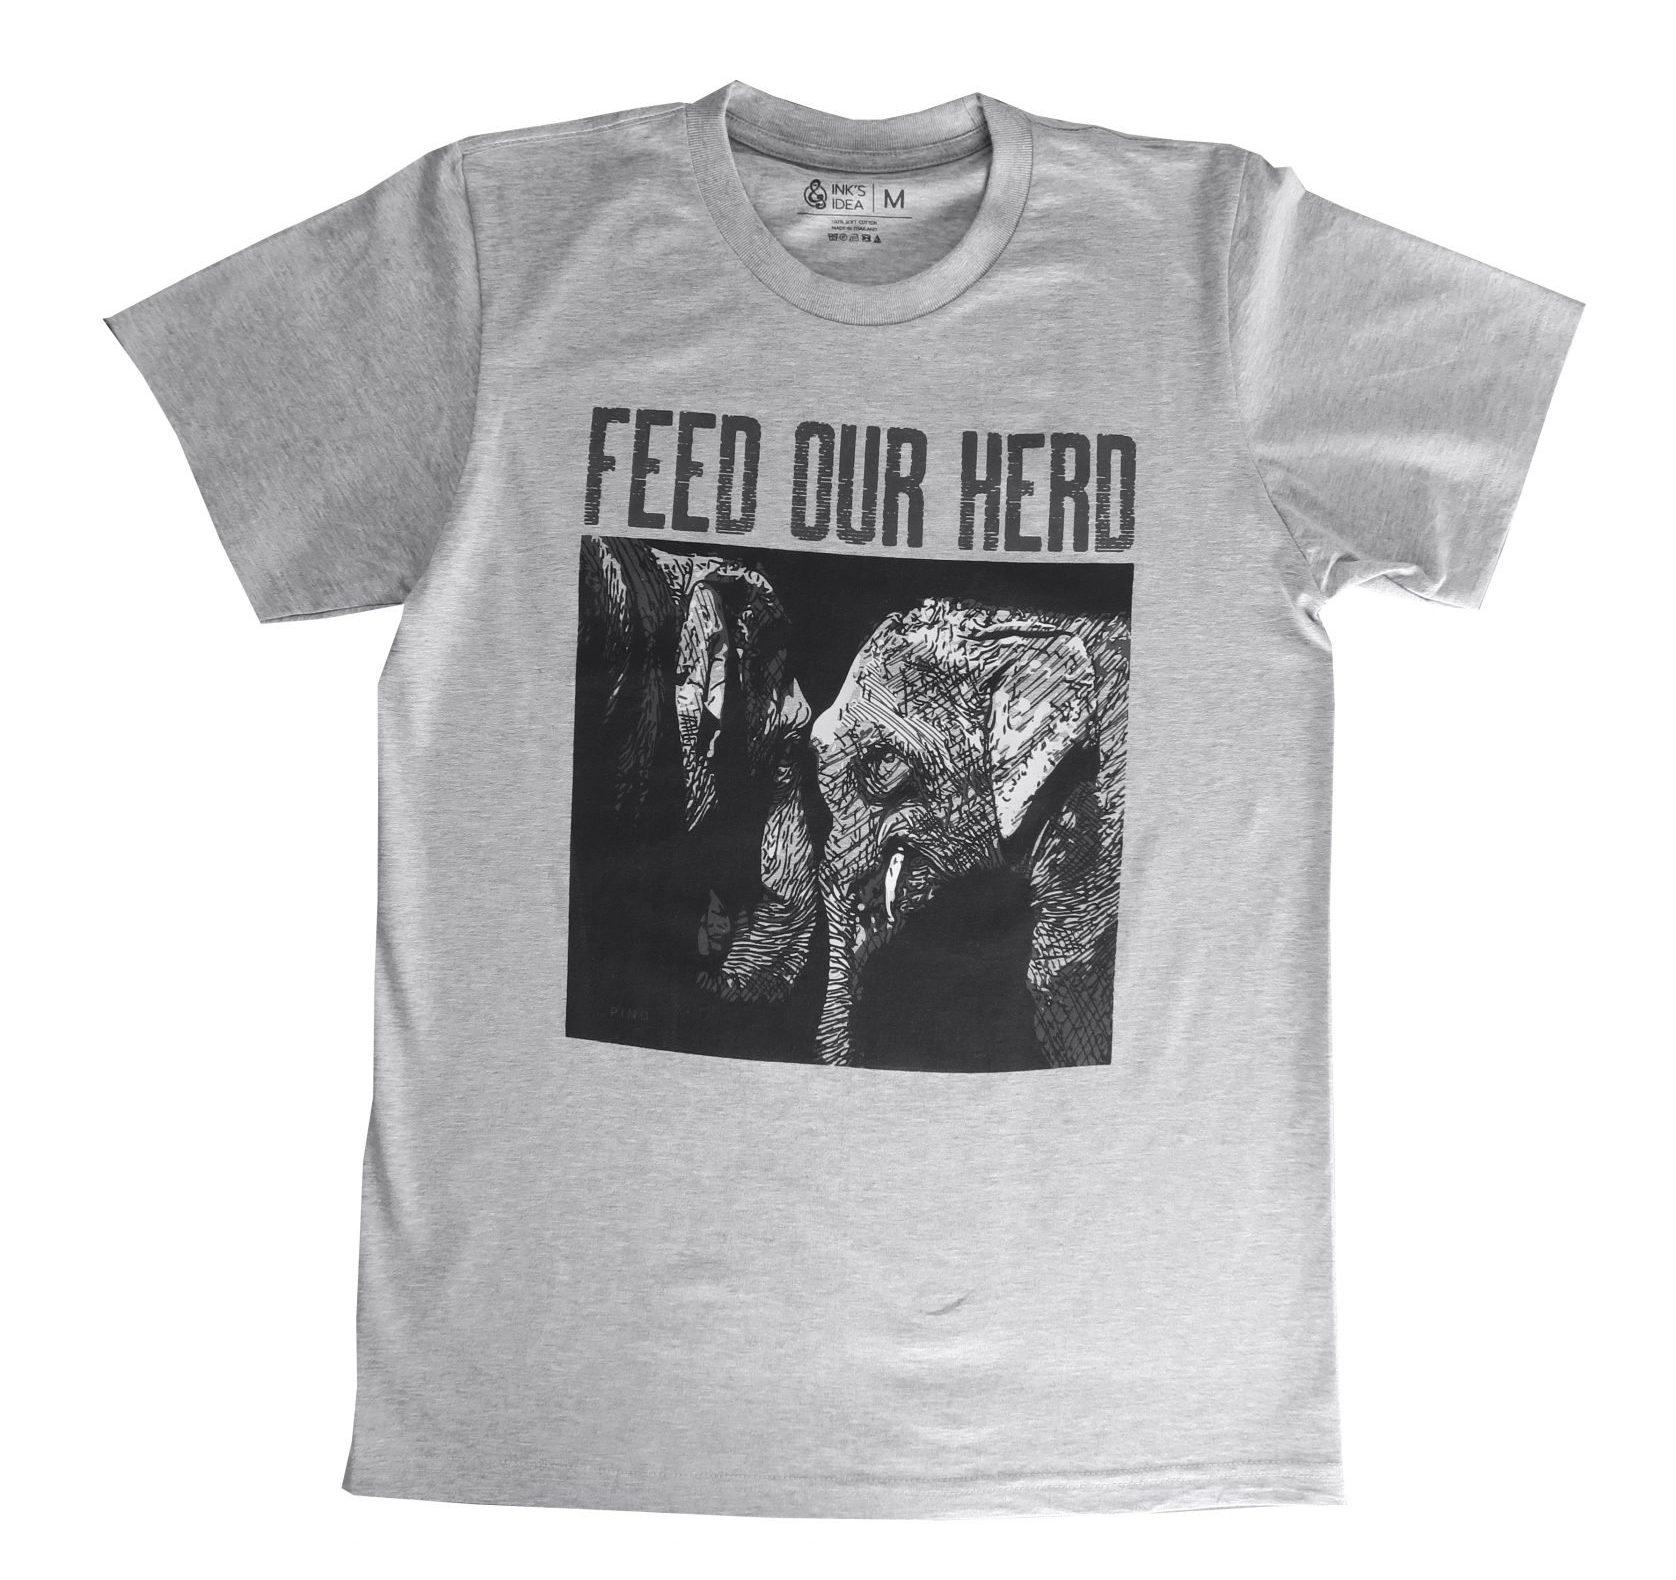 T-shirt Grijs Olifanten Maat M